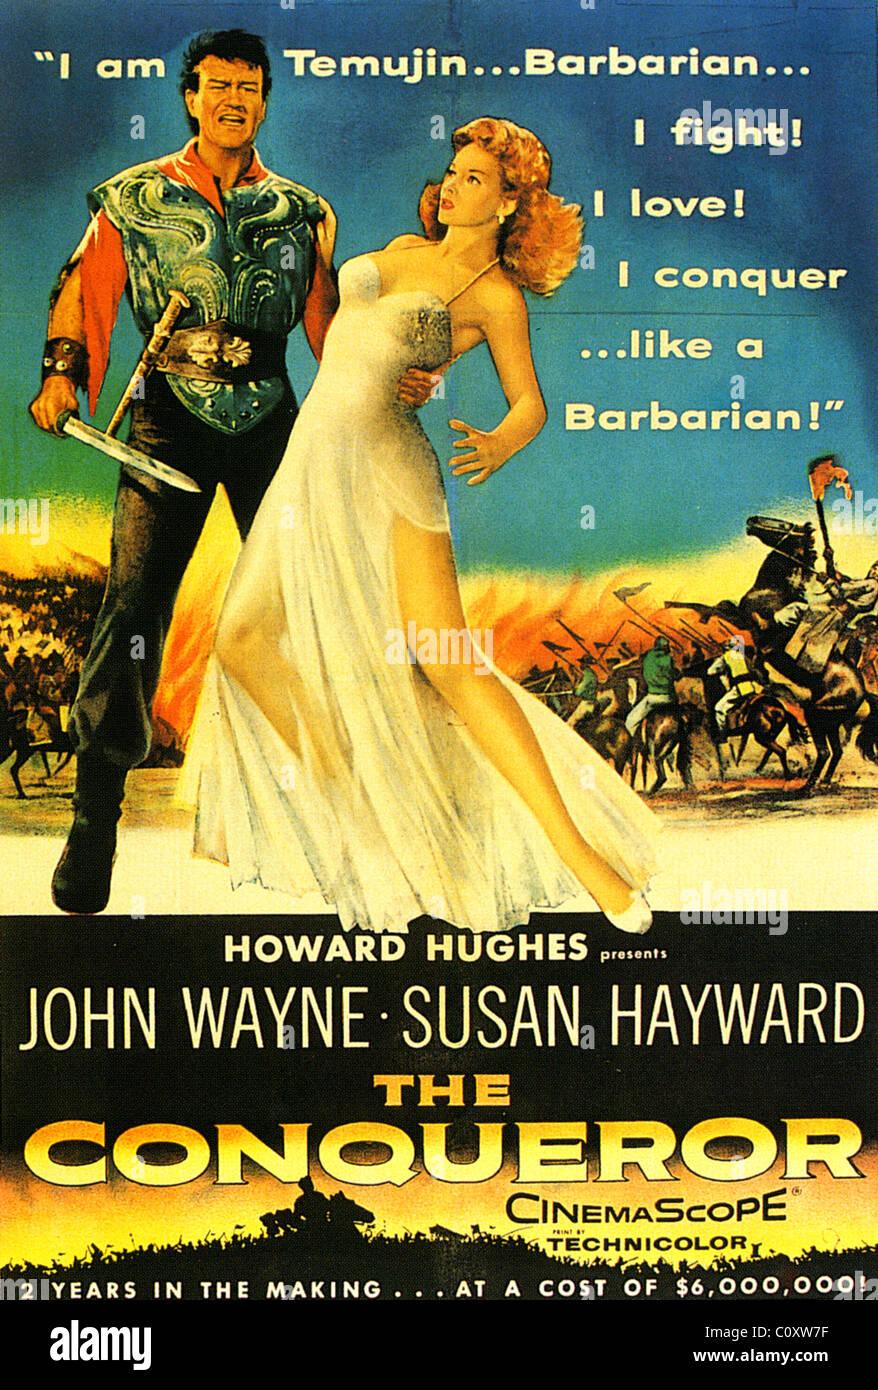 THE CONQUEROR Poster for 1956 RKO film with John Wayne and Susan Hayward - Stock Image